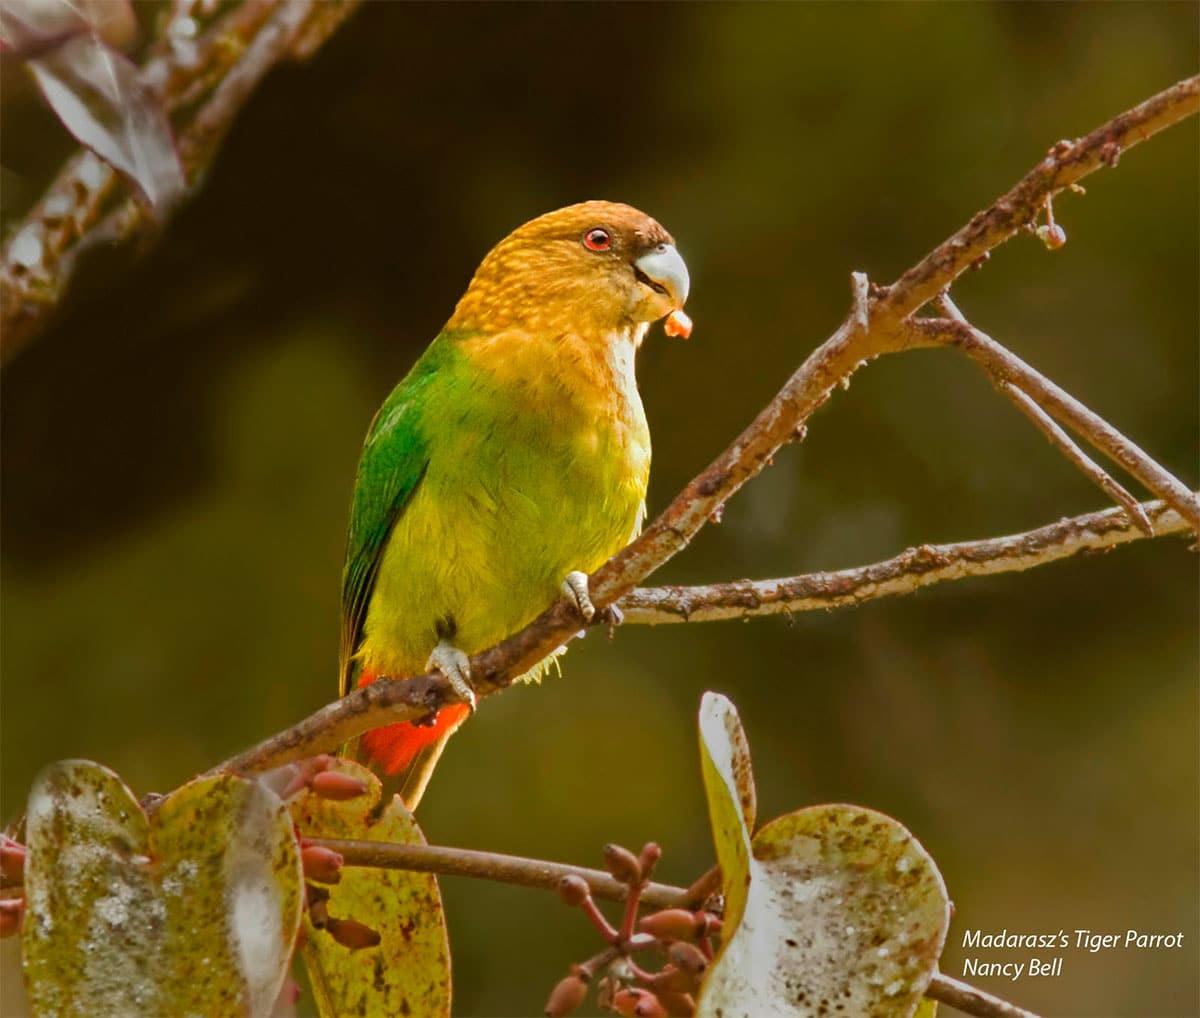 Madarasz's Tiger-Parrot